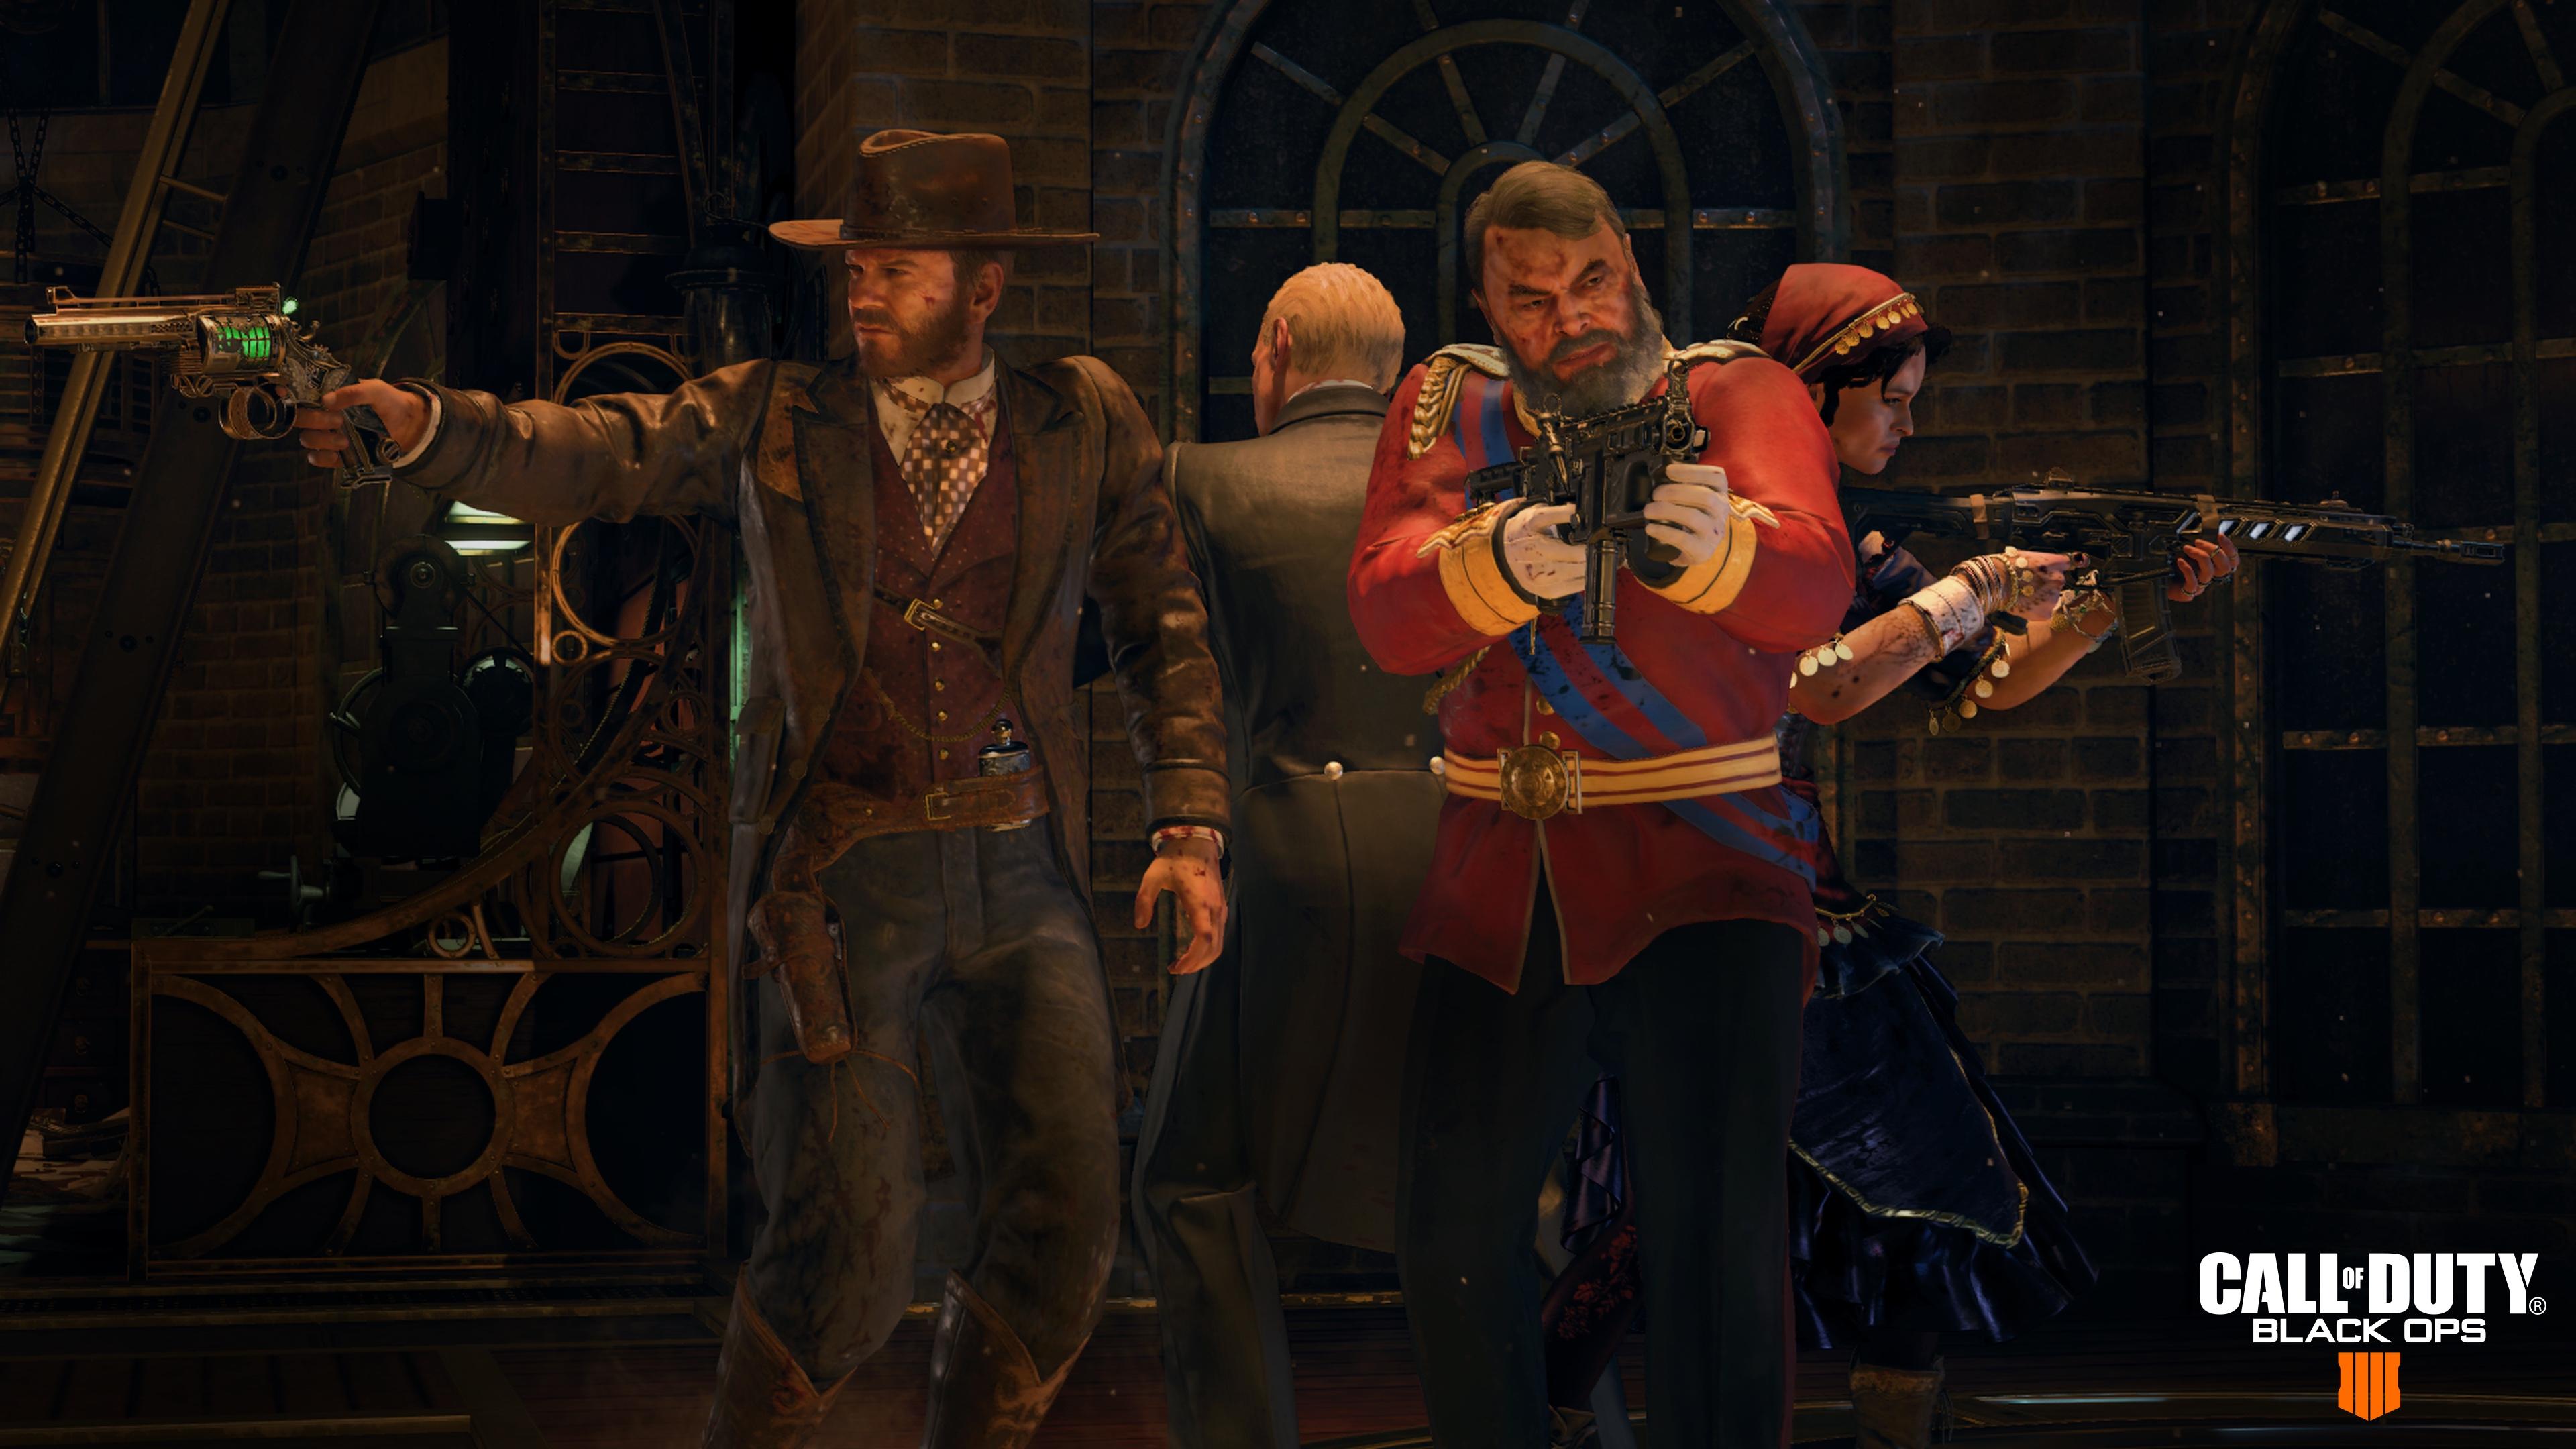 Black Ops 4's new Zombies mode stars Kiefer Sutherland, Helena